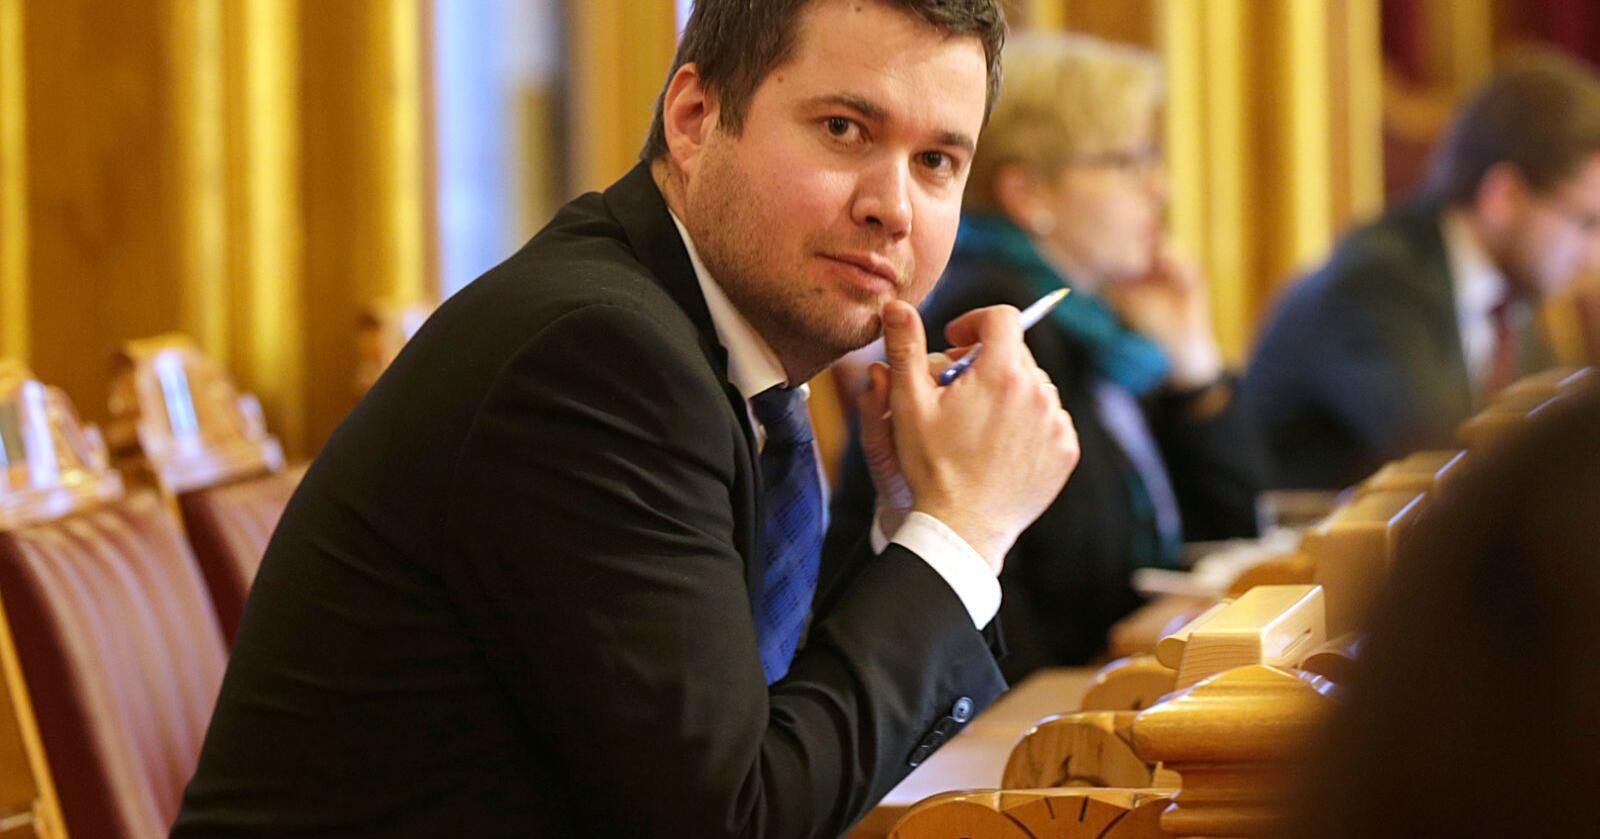 Stortingsrepresentant Geir Pollestad (Sp) vil ha debatt om kjøttbeinmjøl. Foto: Vidar Ruud / NTB scanpix